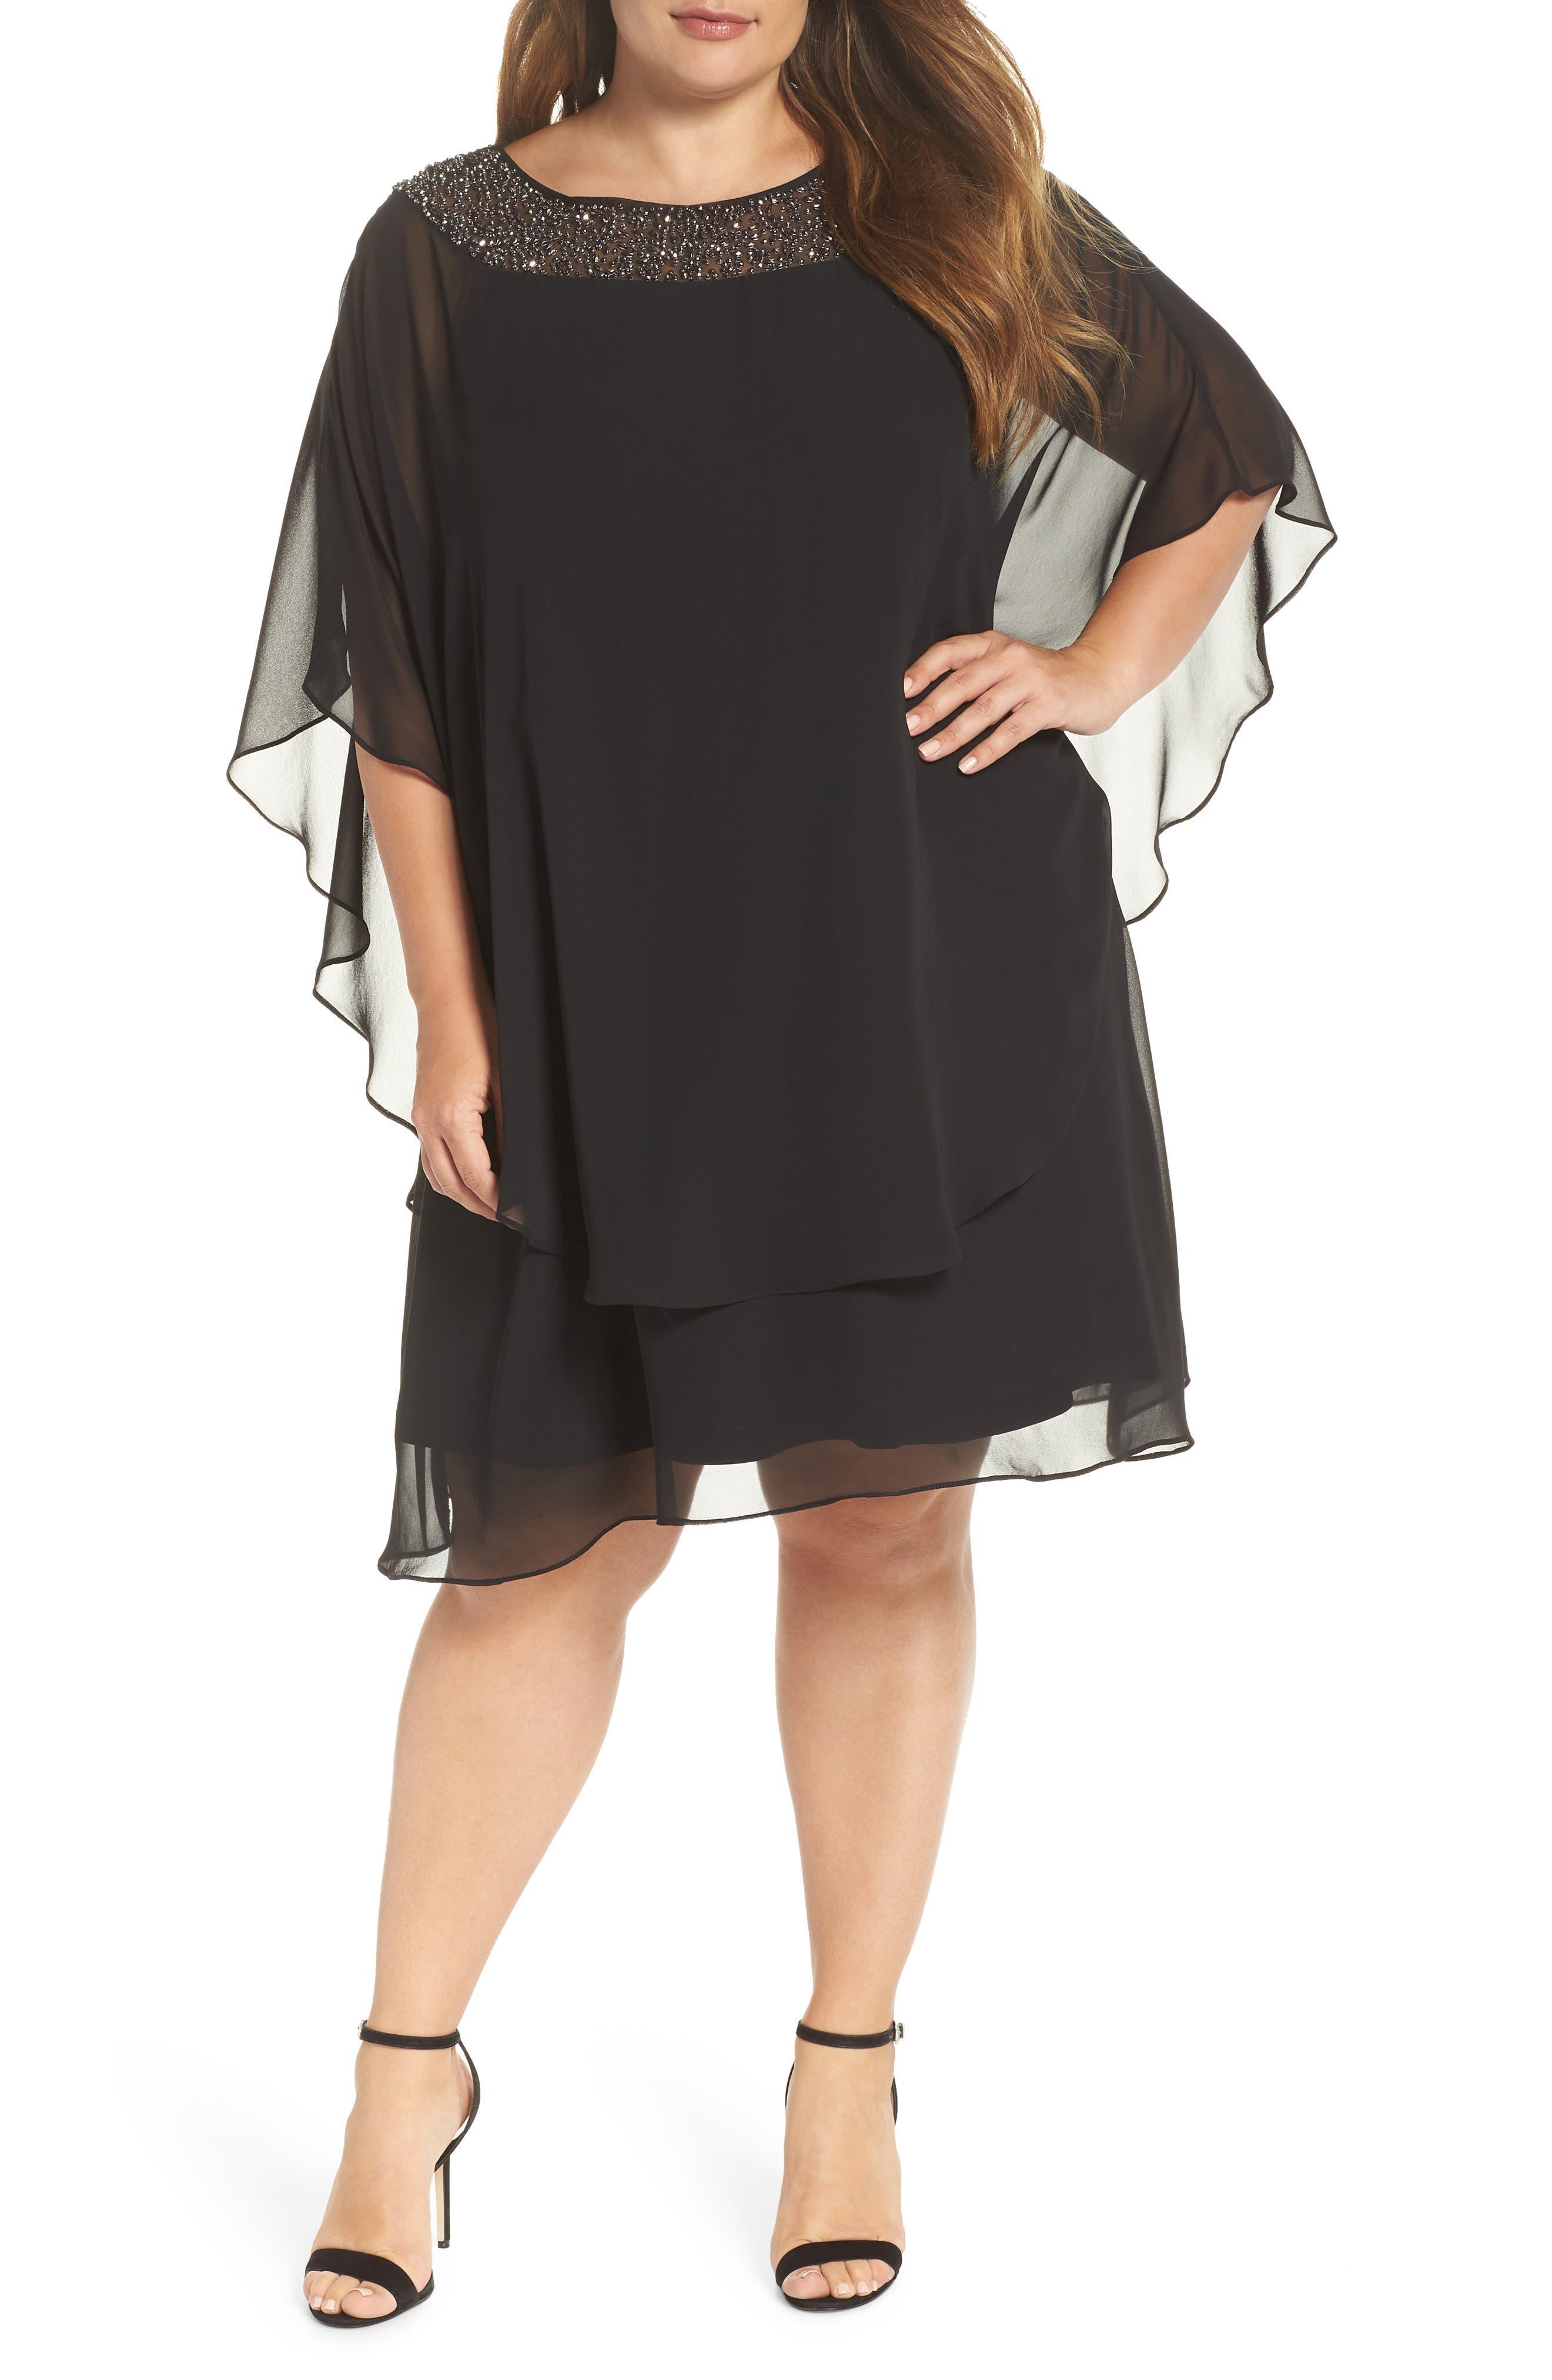 Beaded Neck Chiffon Overlay Dress,                         Main,                         color, BLACK/ GUNMETAL